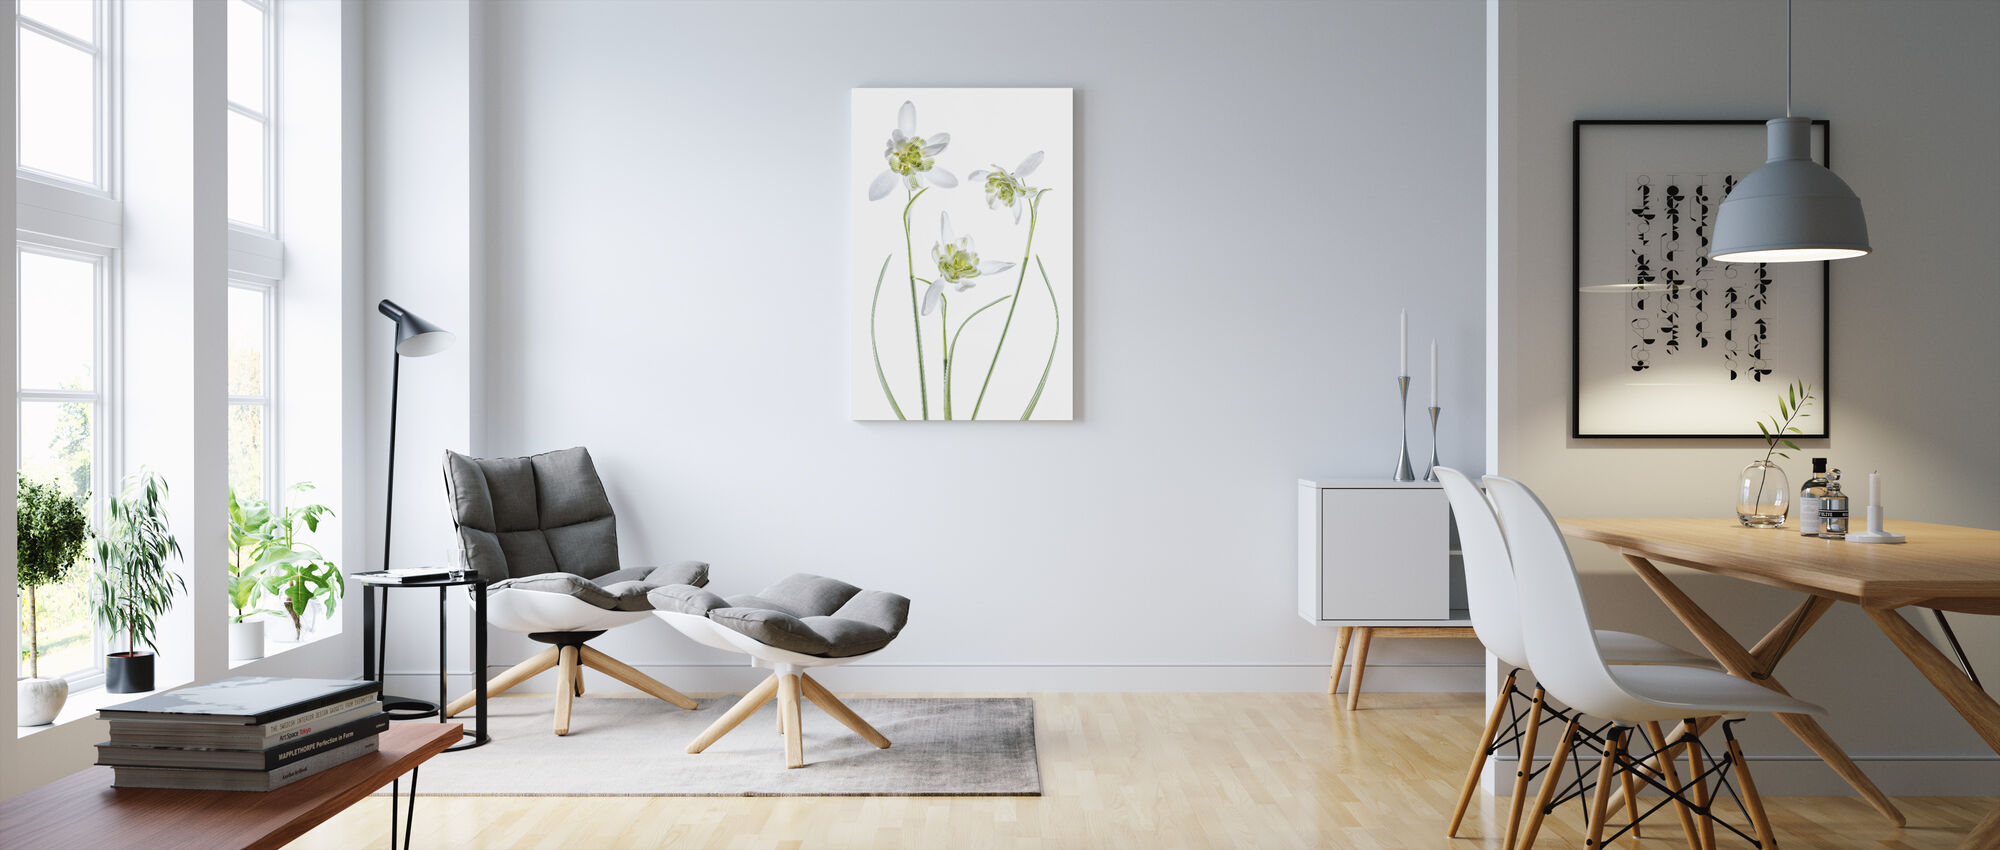 Galanthus Flore Pleno - Canvas print - Living Room